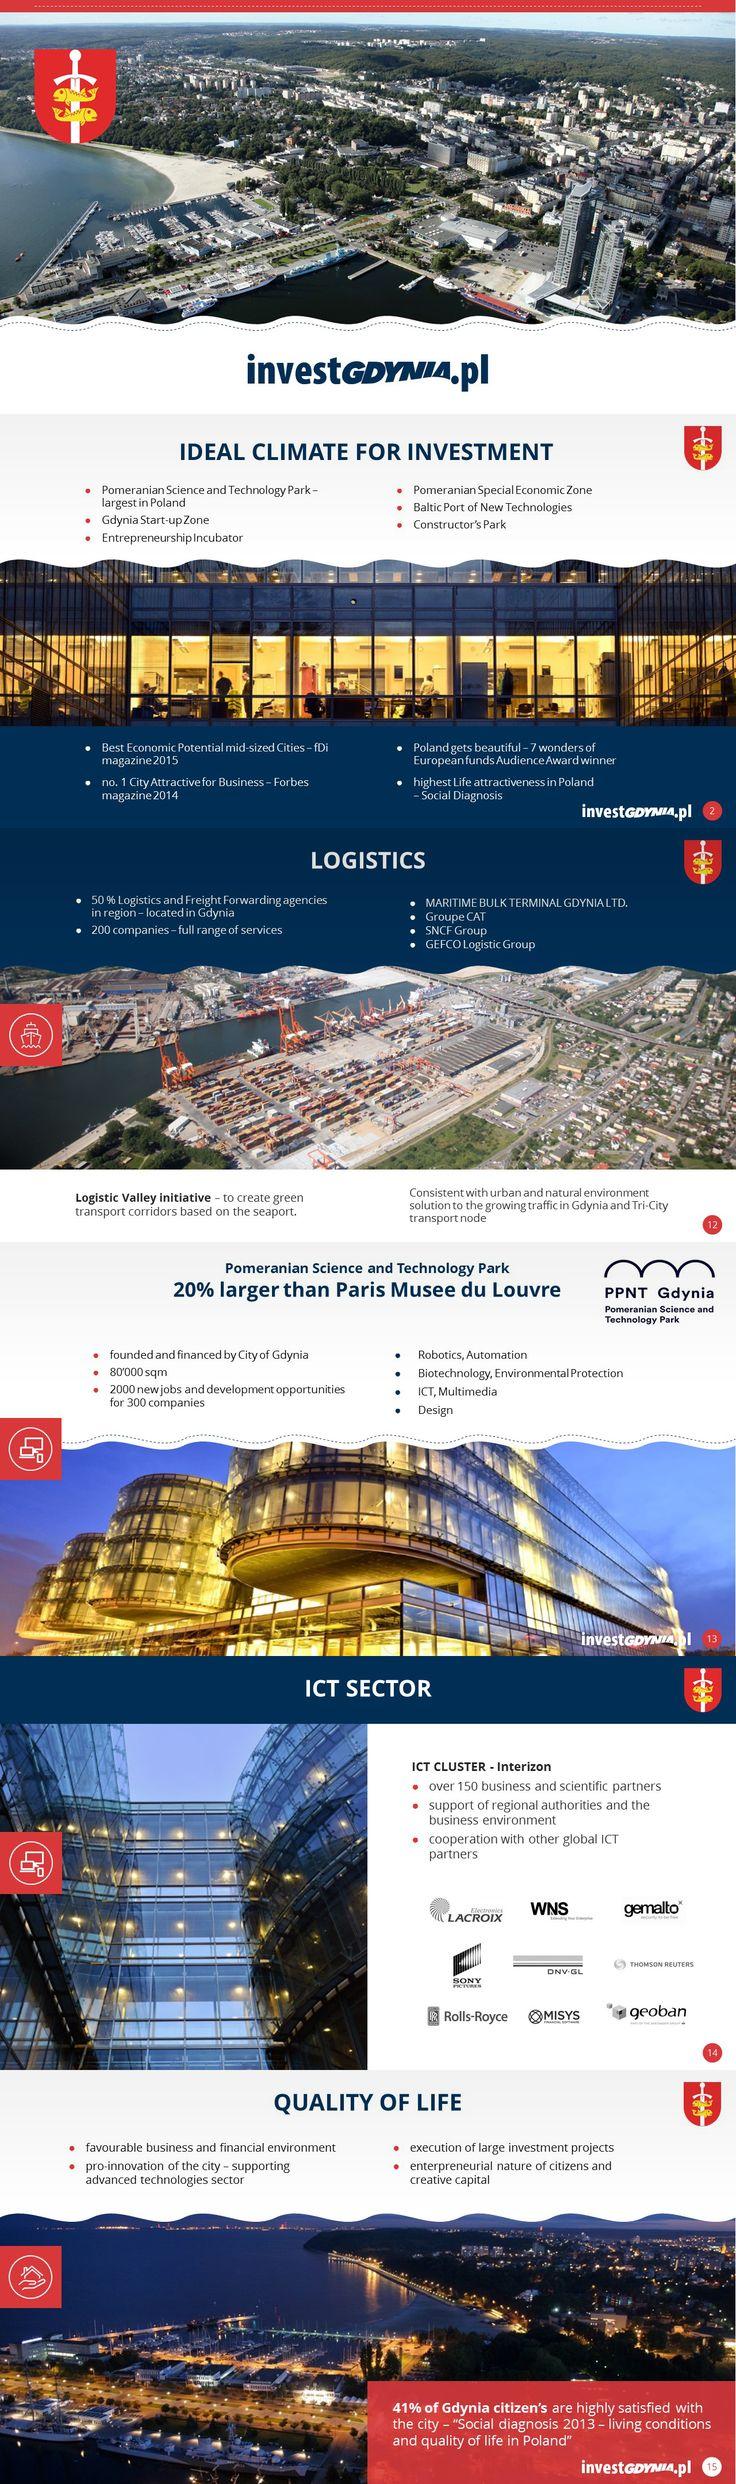 Gdynia - Power Point presentation